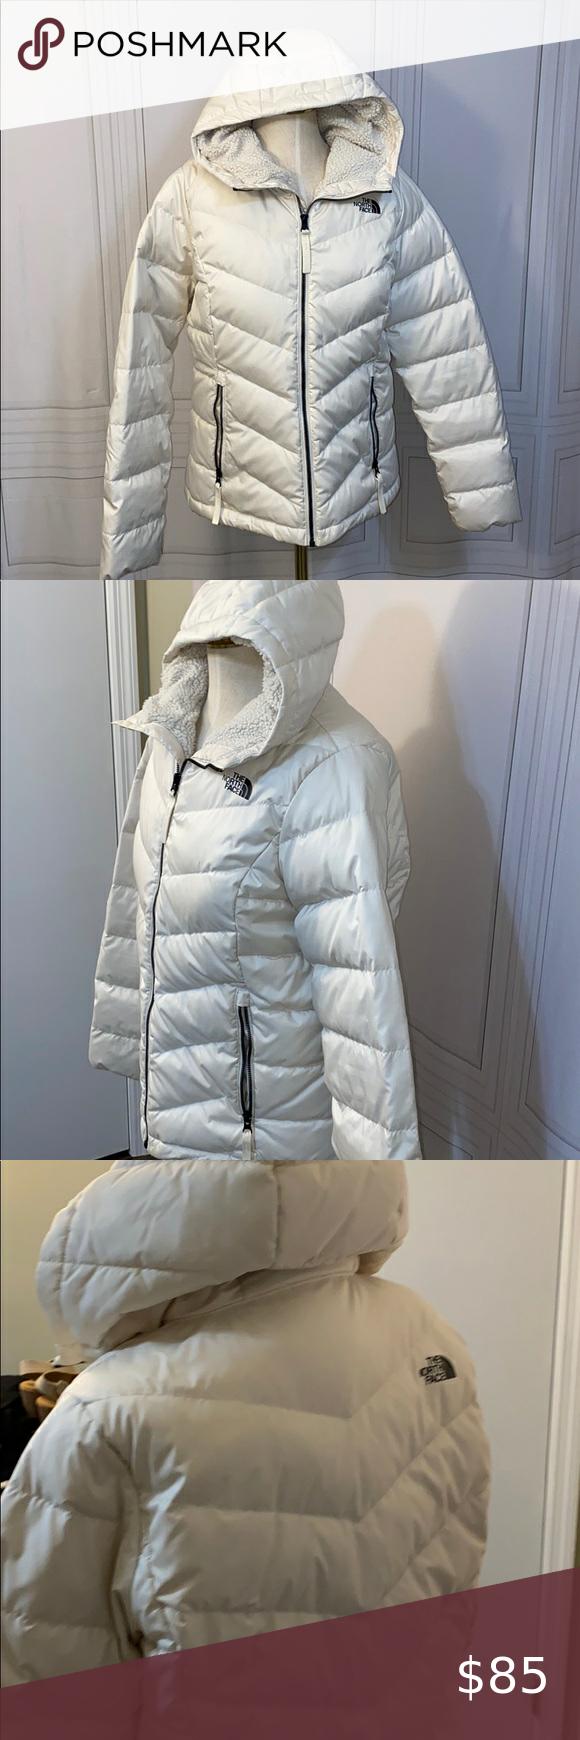 The North Face Cream Coat Blue North Face Jacket Pink North Face Jacket North Face Fleece Jacket [ 1740 x 580 Pixel ]